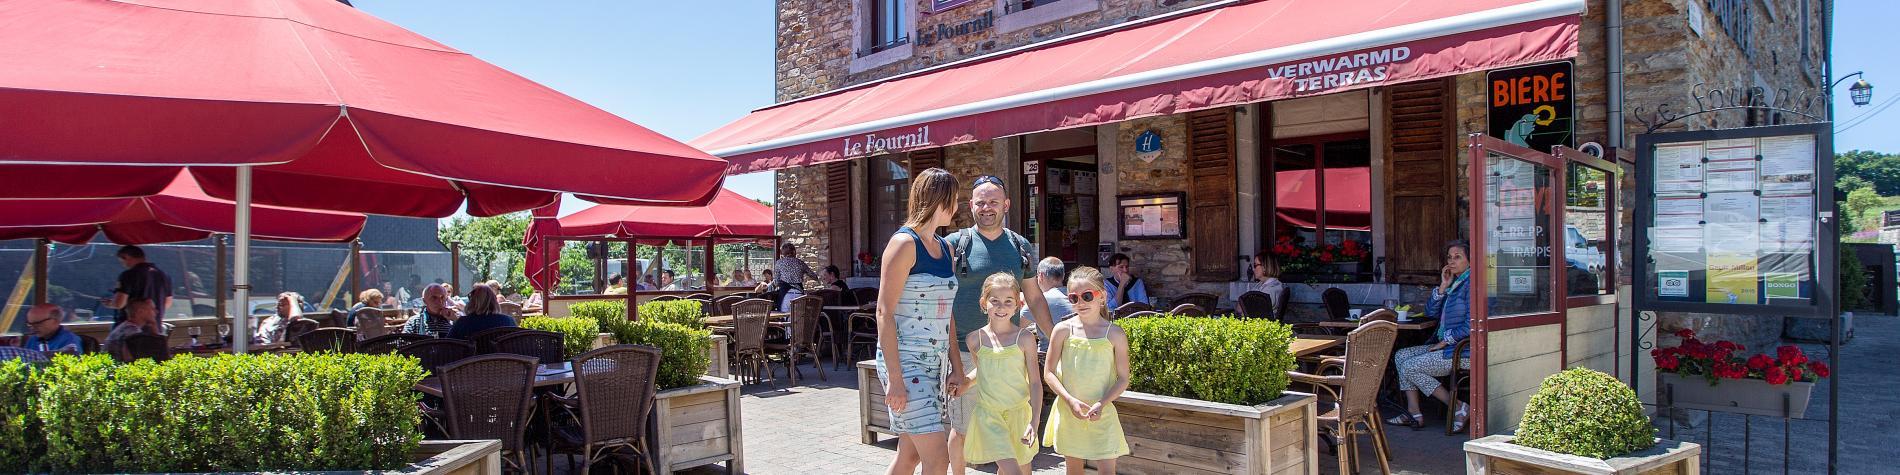 Famille - Village - ruralité - Redu - Libin - Luxembourg